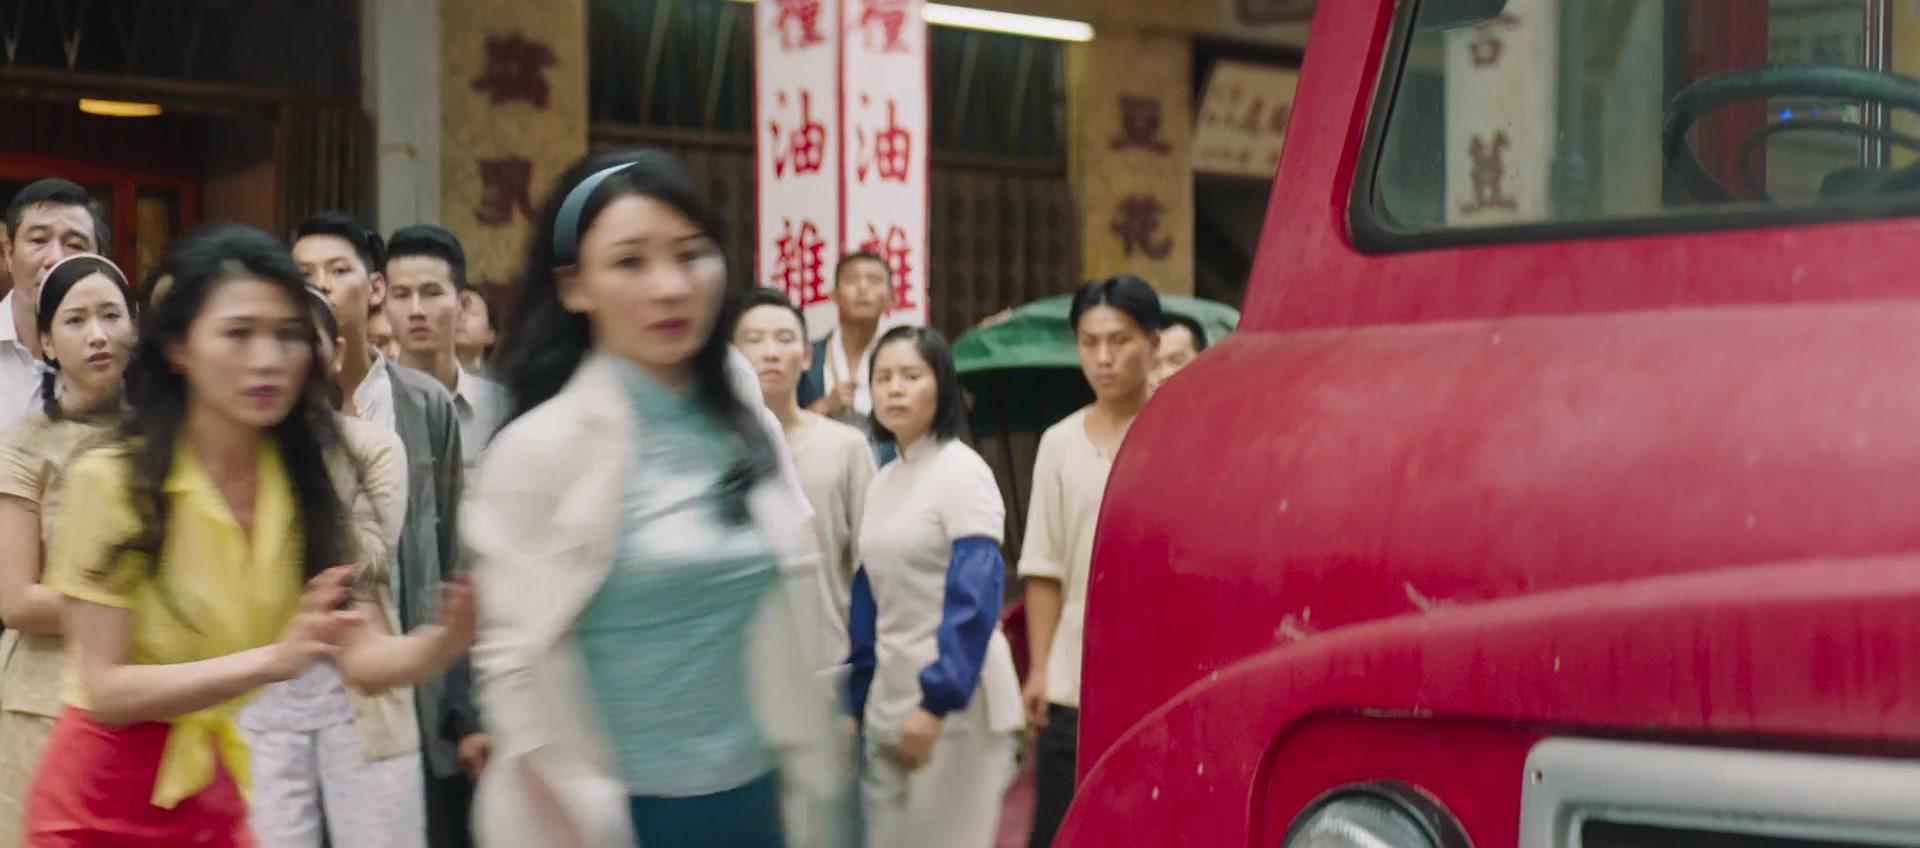 Master Z The Ip Man Legacy (2018) 1080p BluRay x264 {Dual Audio} [Hindi+CH]-DREDD